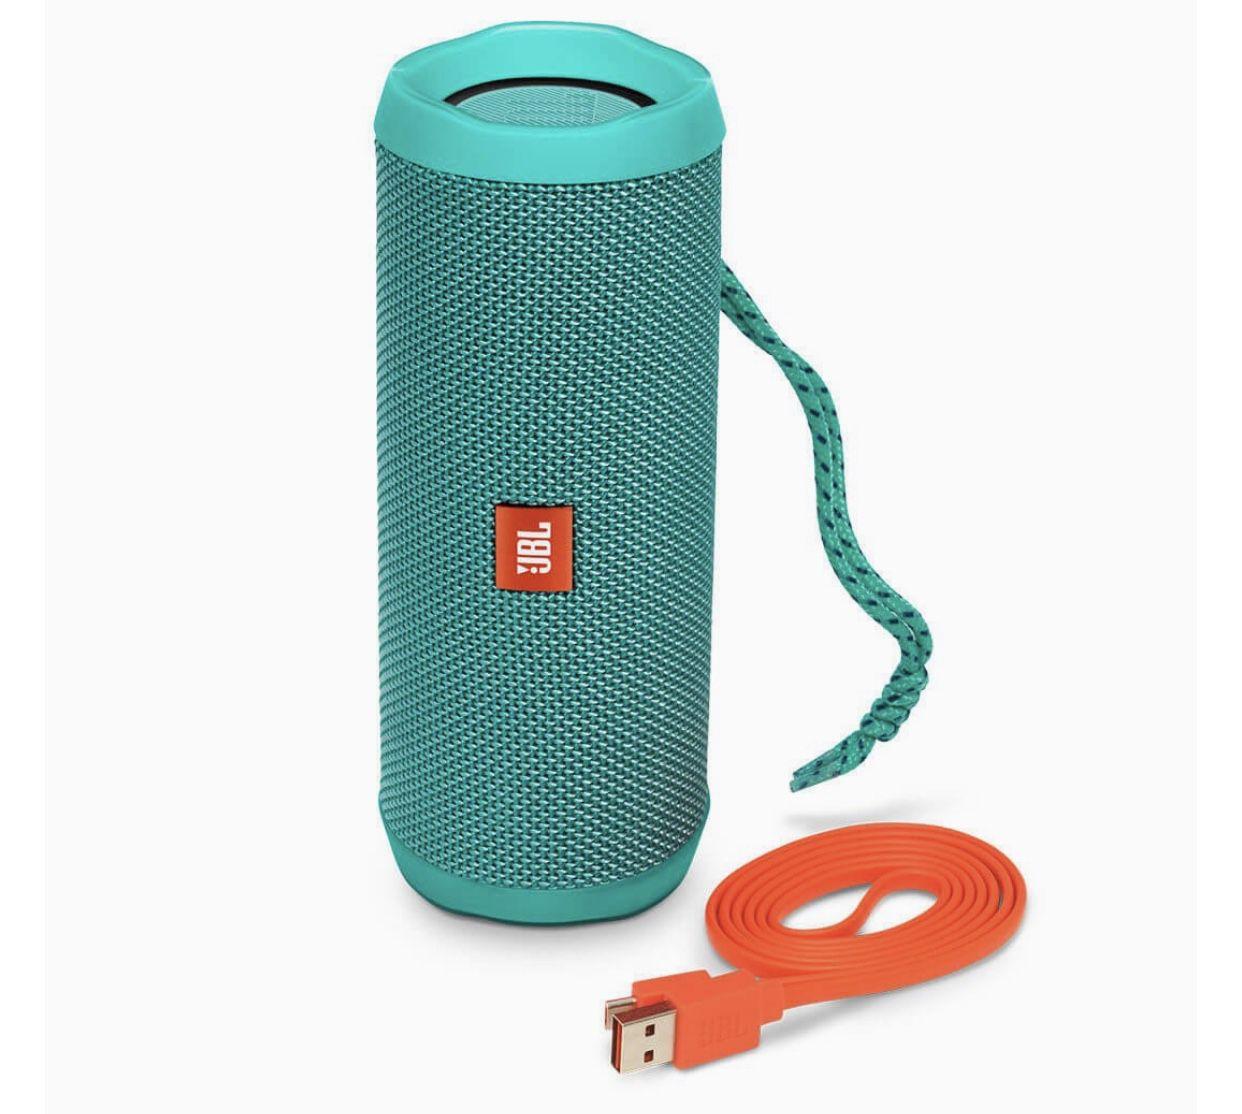 Mint Green JBL Flip 4 Wireless Bluetooth Speaker